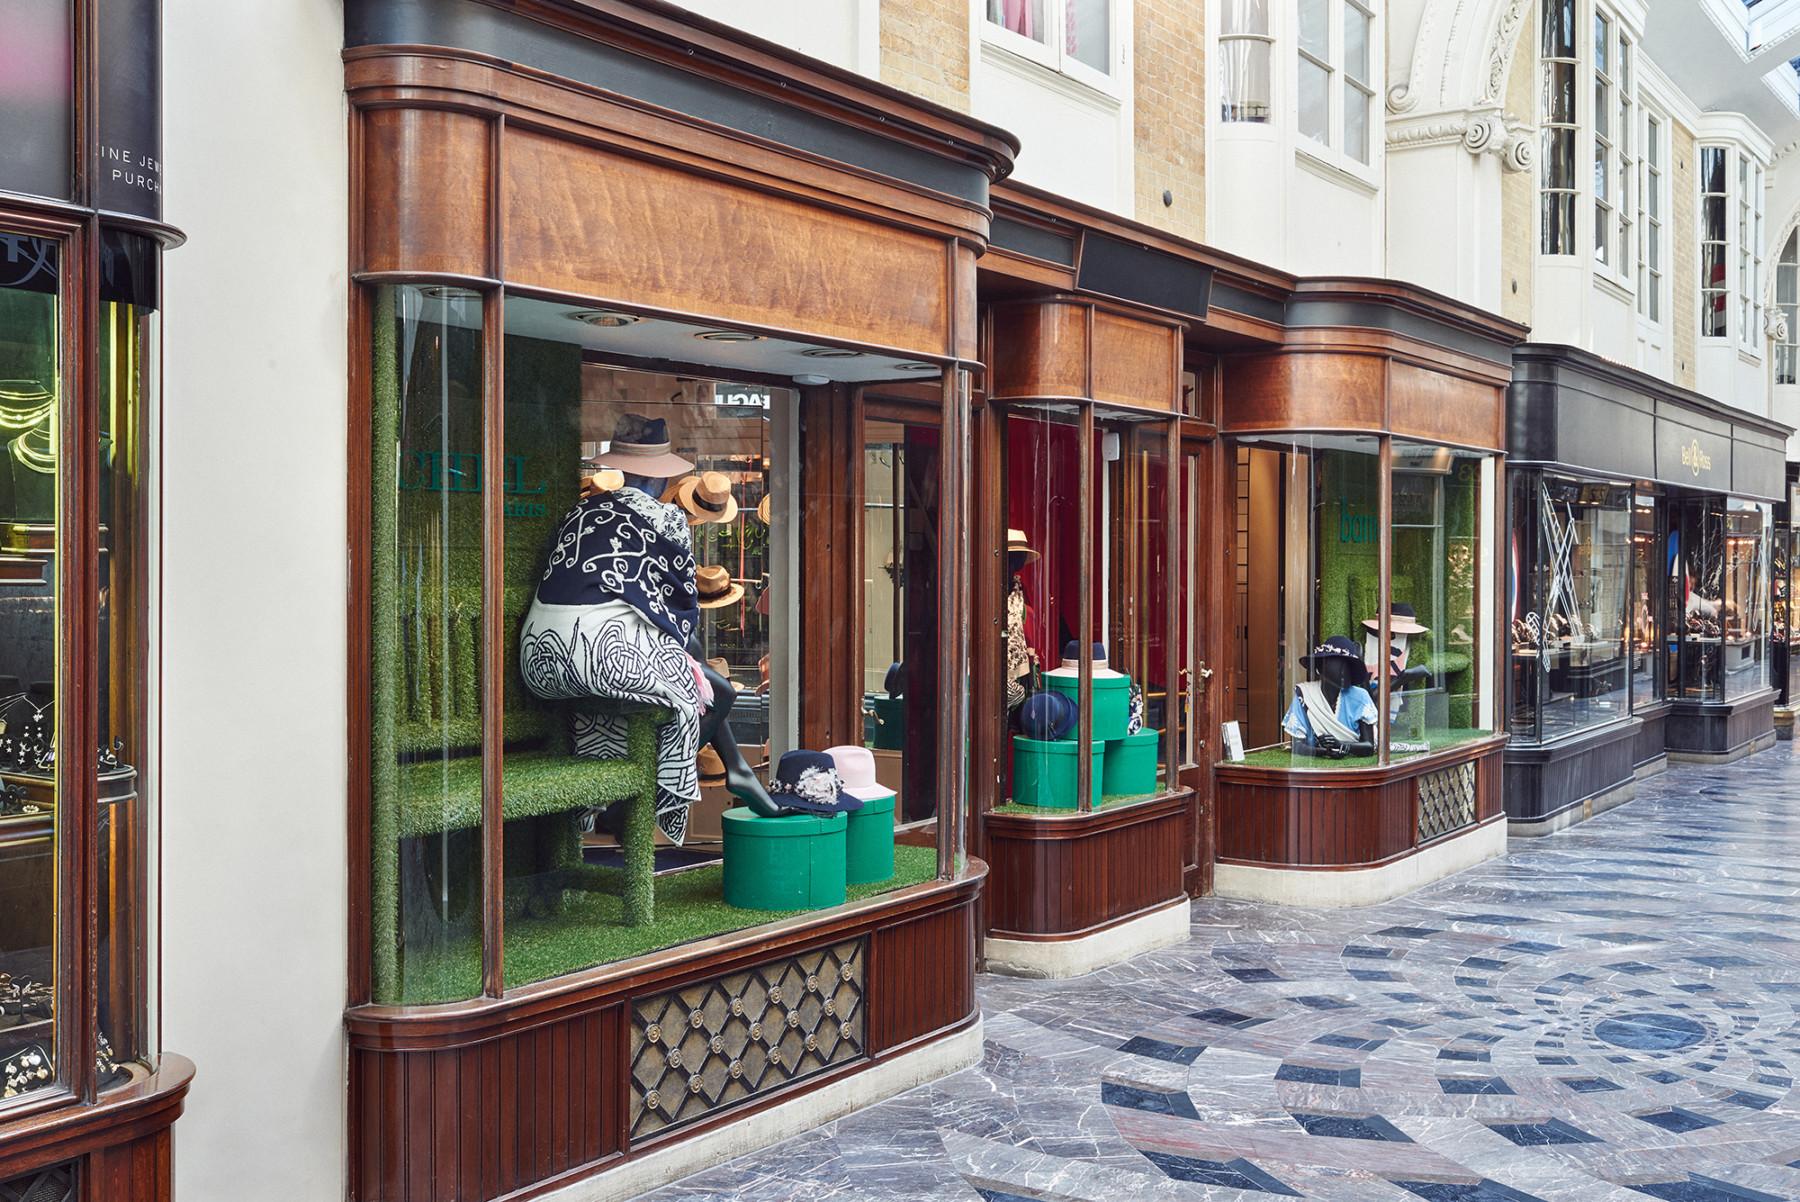 Burlington-Arcade-Piccadilly-London-Royal-Academy-Jamie-Fobert-Architects--British-stone-floor-marble-mosaic-shop